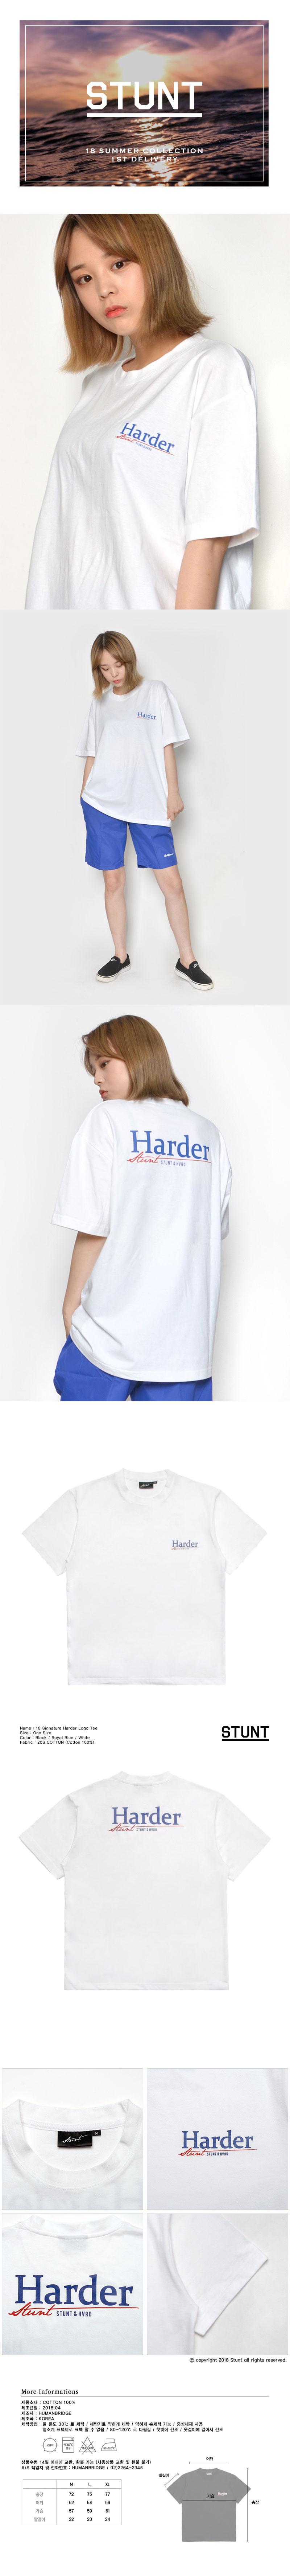 18-signature-harder-logo-tee-(white).jpg